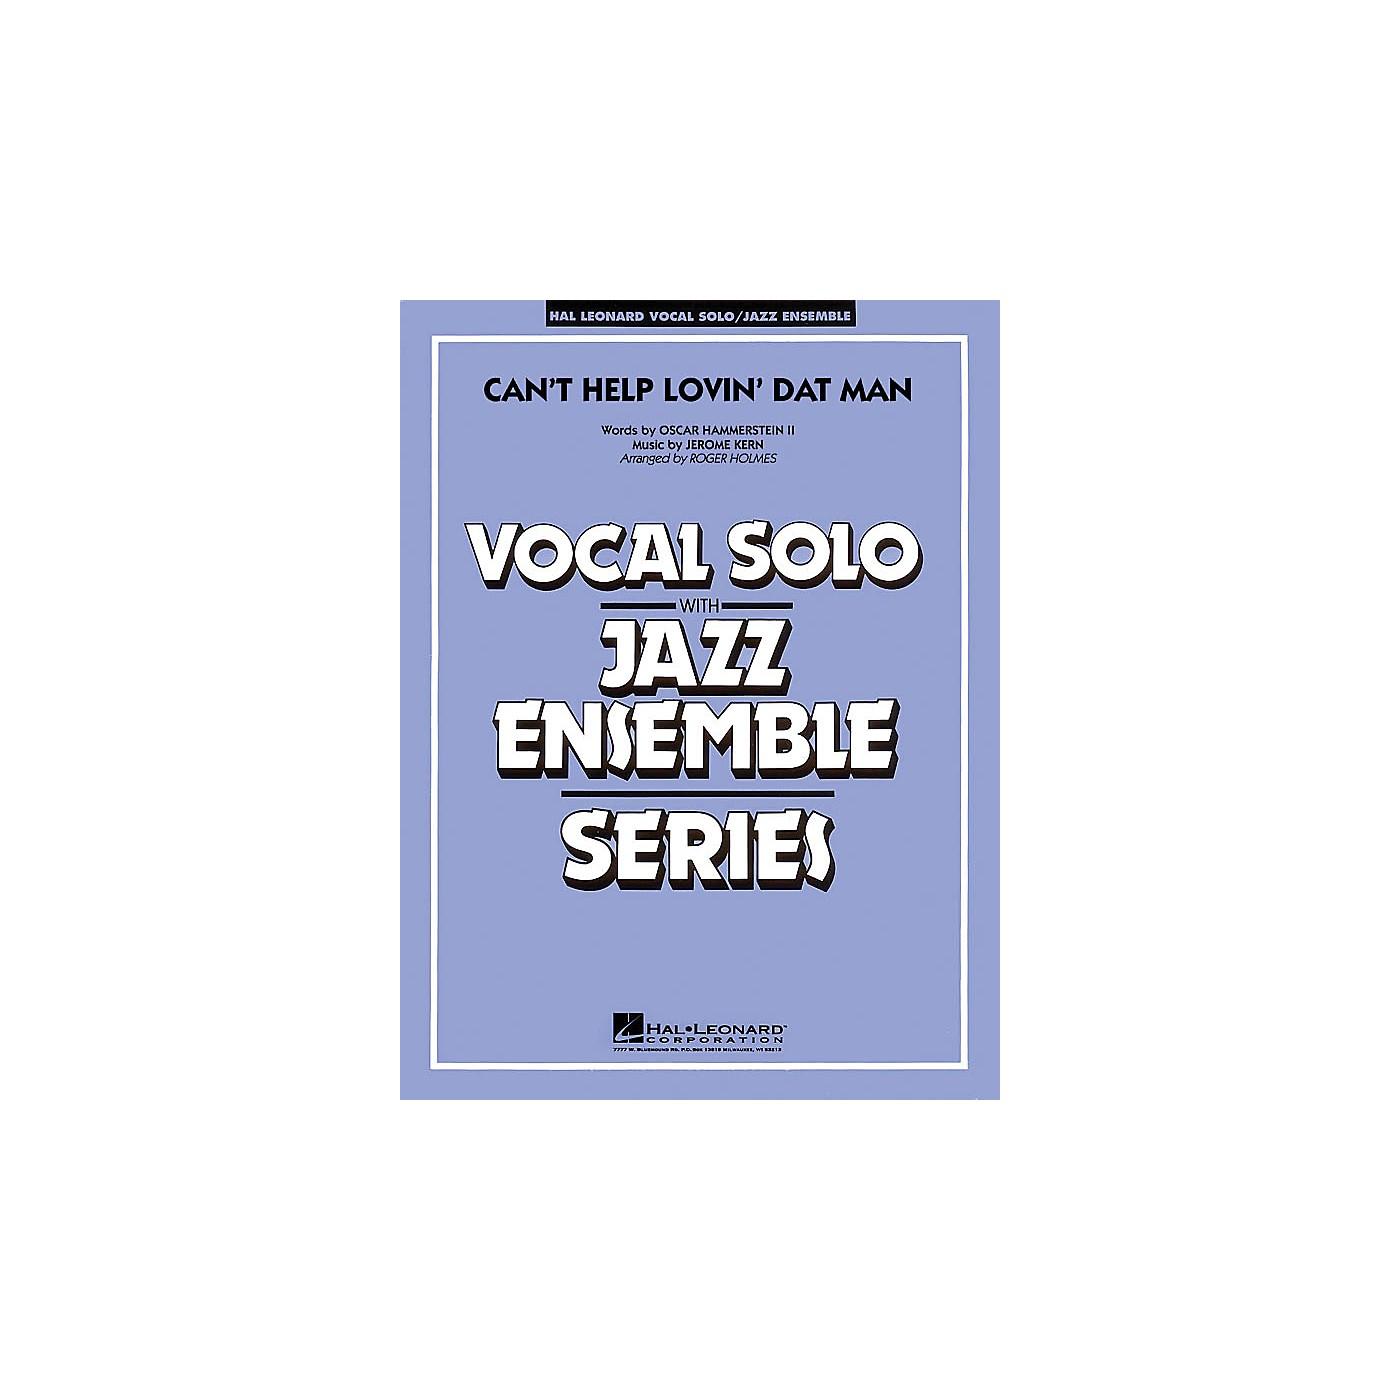 Hal Leonard Can't Help Lovin' Dat Man (Key: C, Db, D) Jazz Band Level 4 Composed by Jerome Kern thumbnail